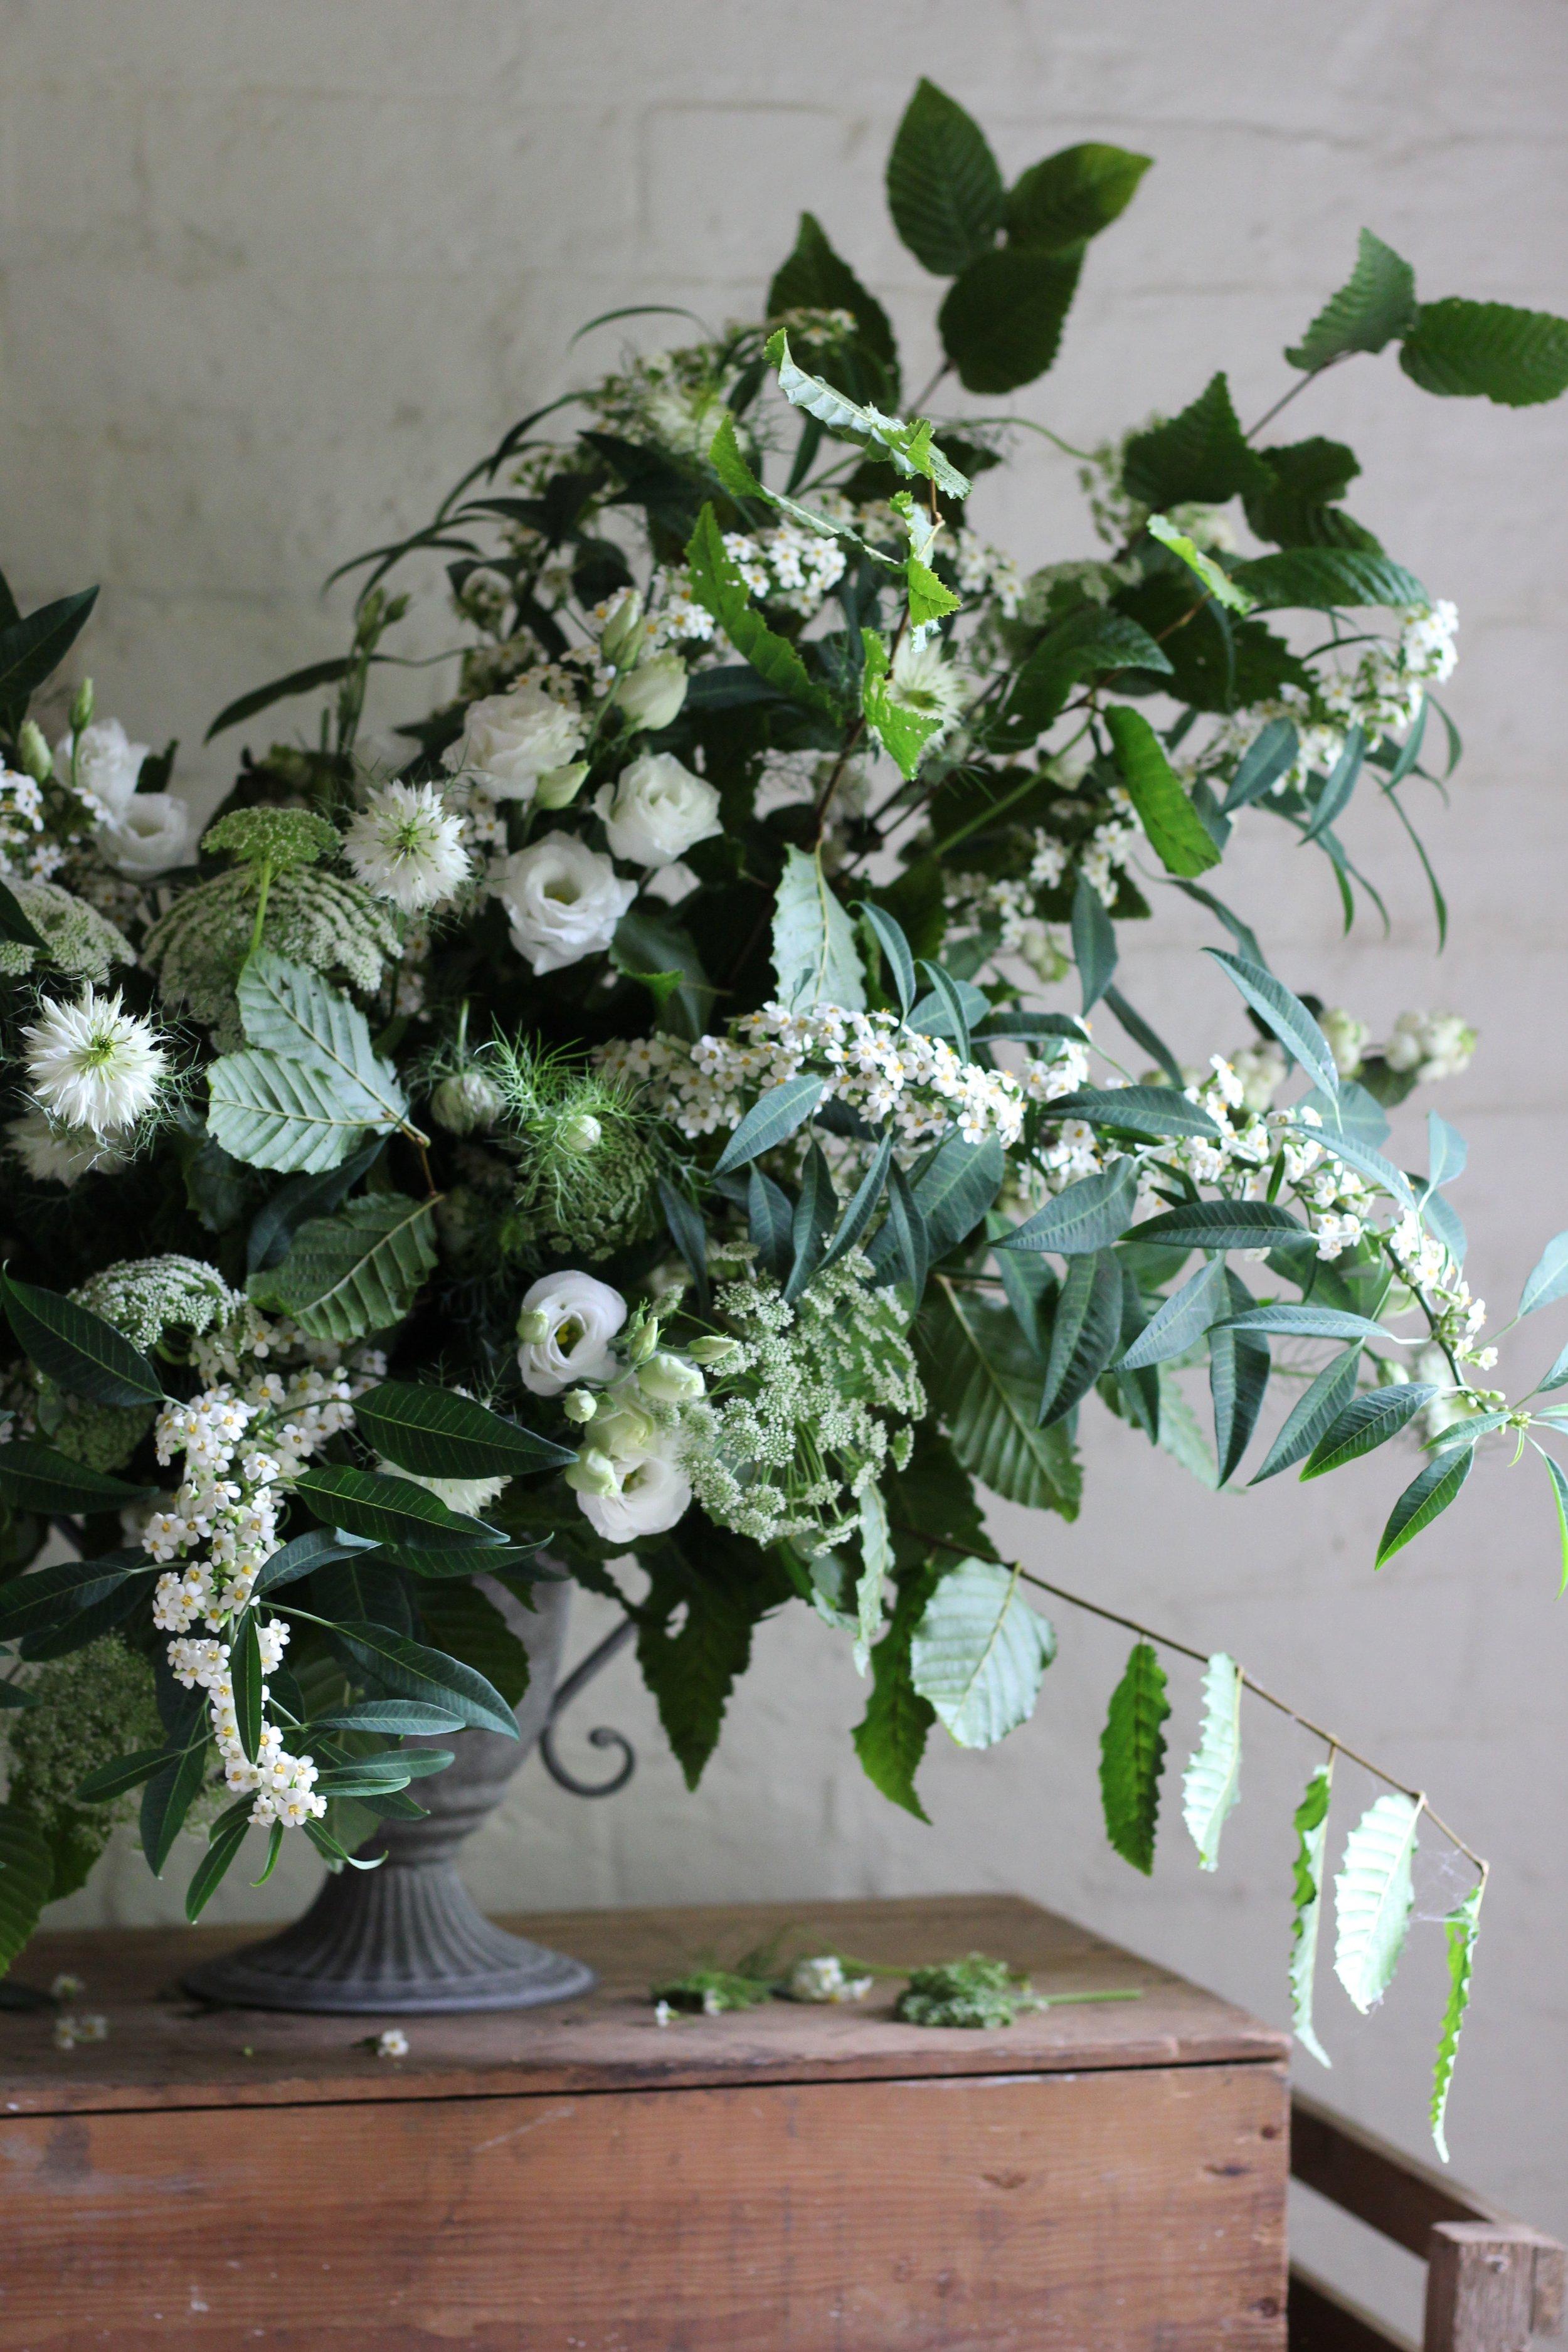 Jennifer Pinder Kent London florist flowers does a botanical themed green and white wedding at Jamies italain restaurant in London threadneedle street_1027.jpg